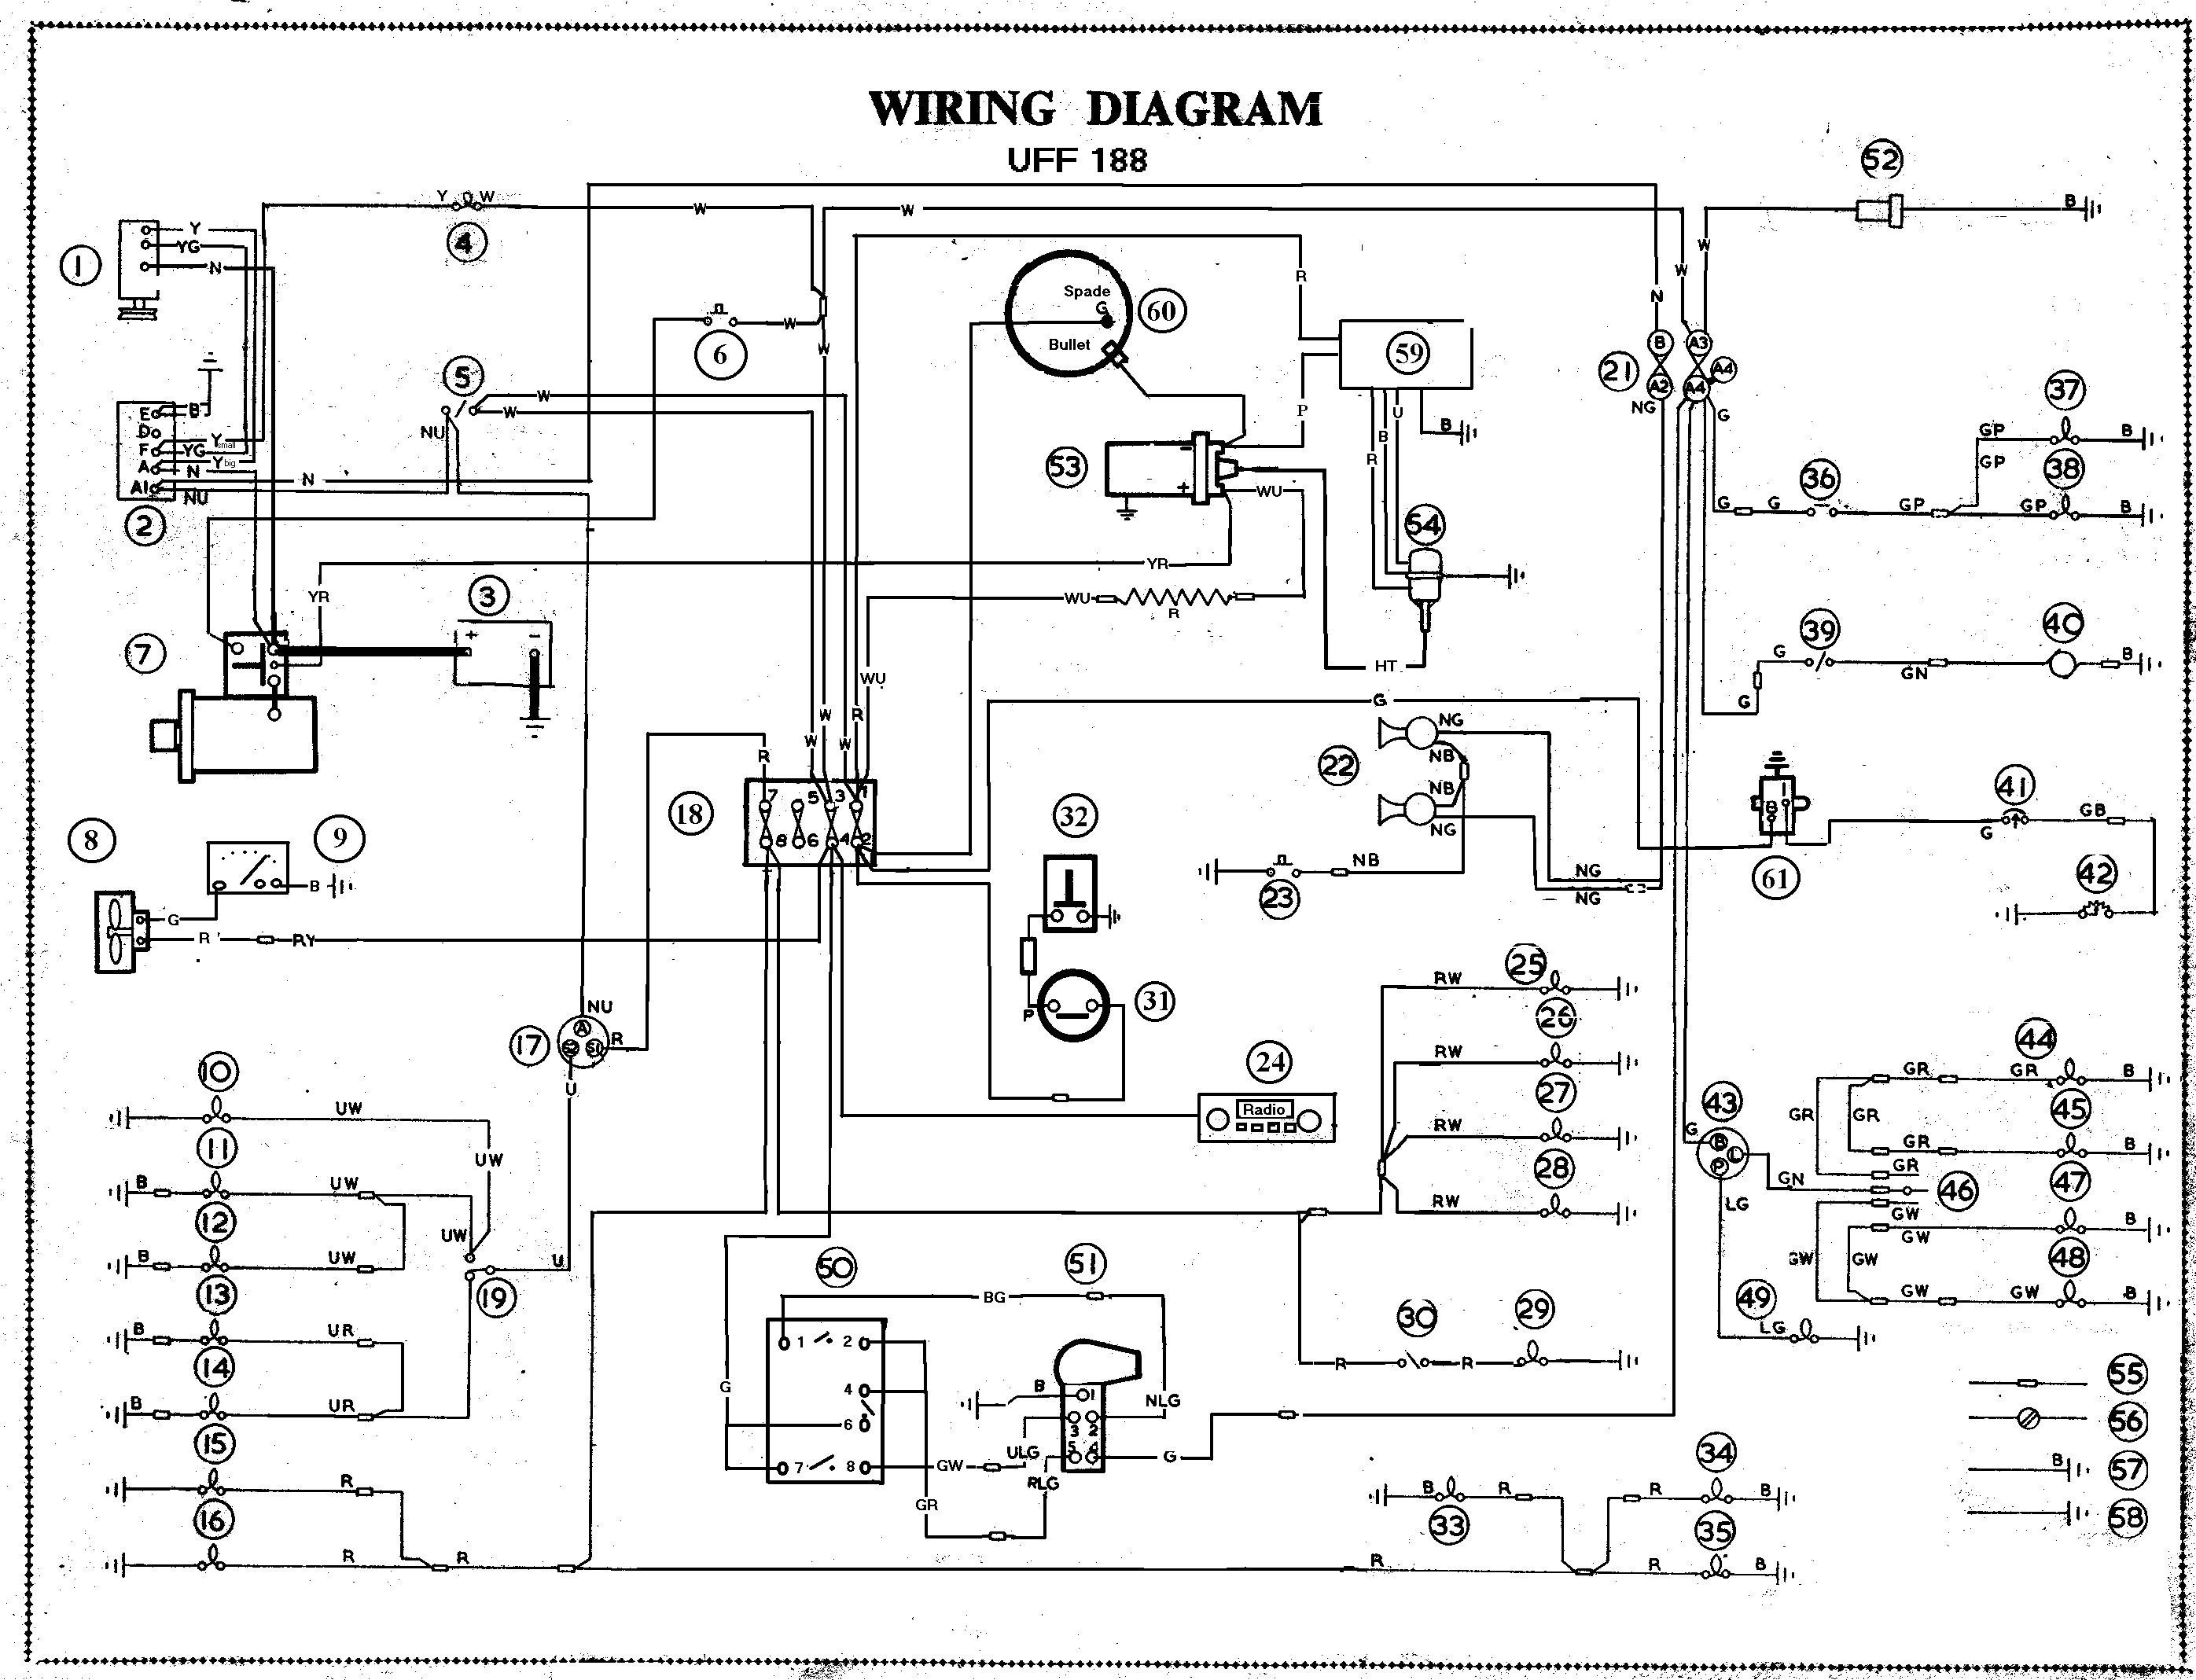 Car Parts Diagram software Car Wiring Diagram Website Data Schematics Wiring Diagram • Of Car Parts Diagram software